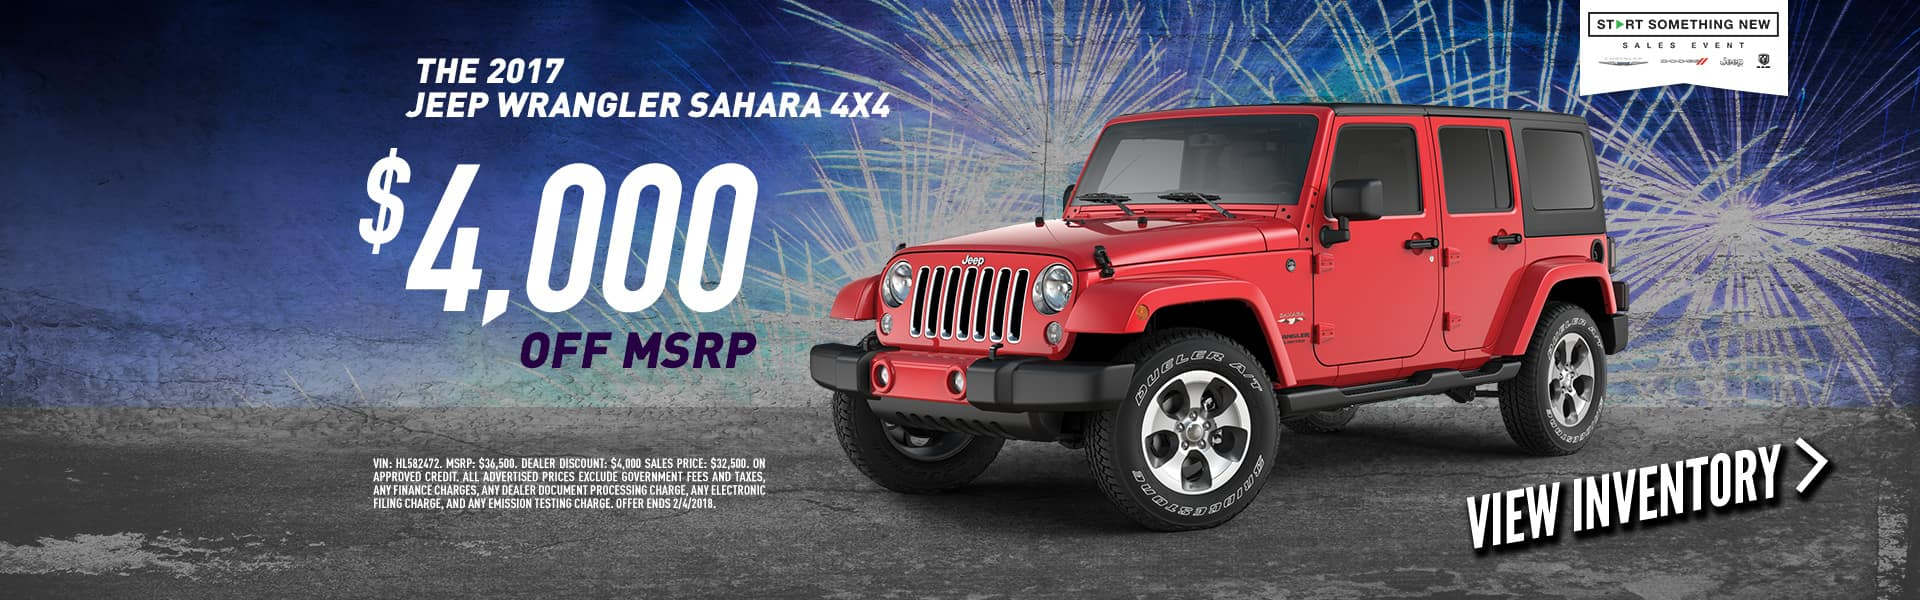 Rancho Chrysler Jeep Dodge Ram Dealership San Diego 92111